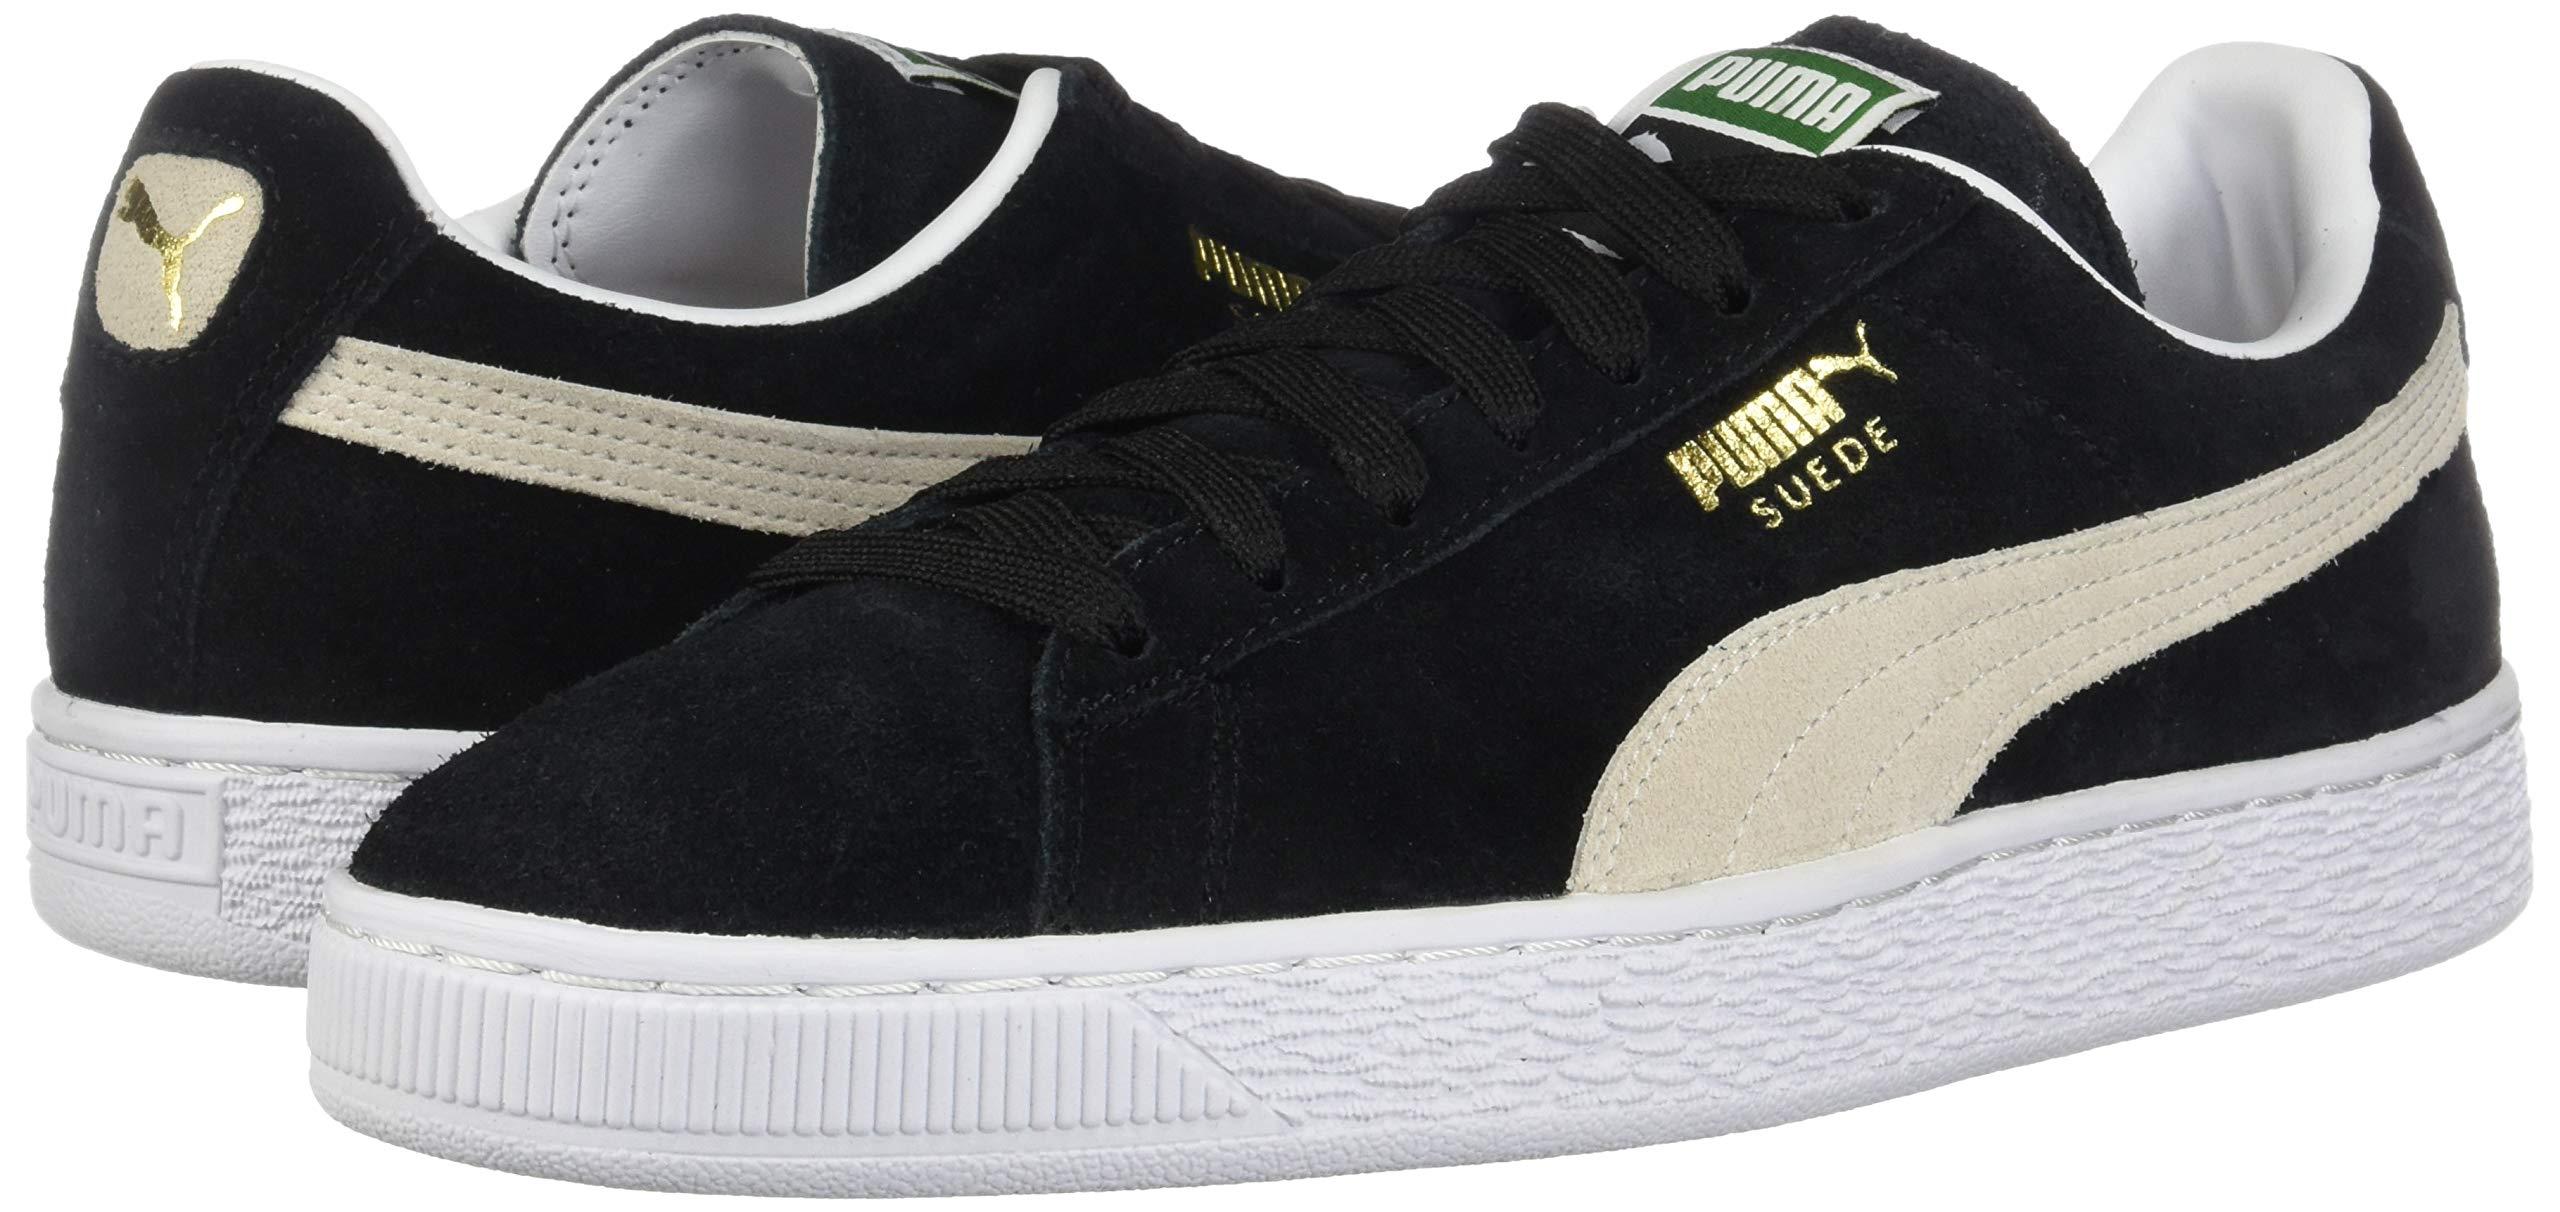 PUMA Select Men's Suede Classic Plus Sneakers Buy Online